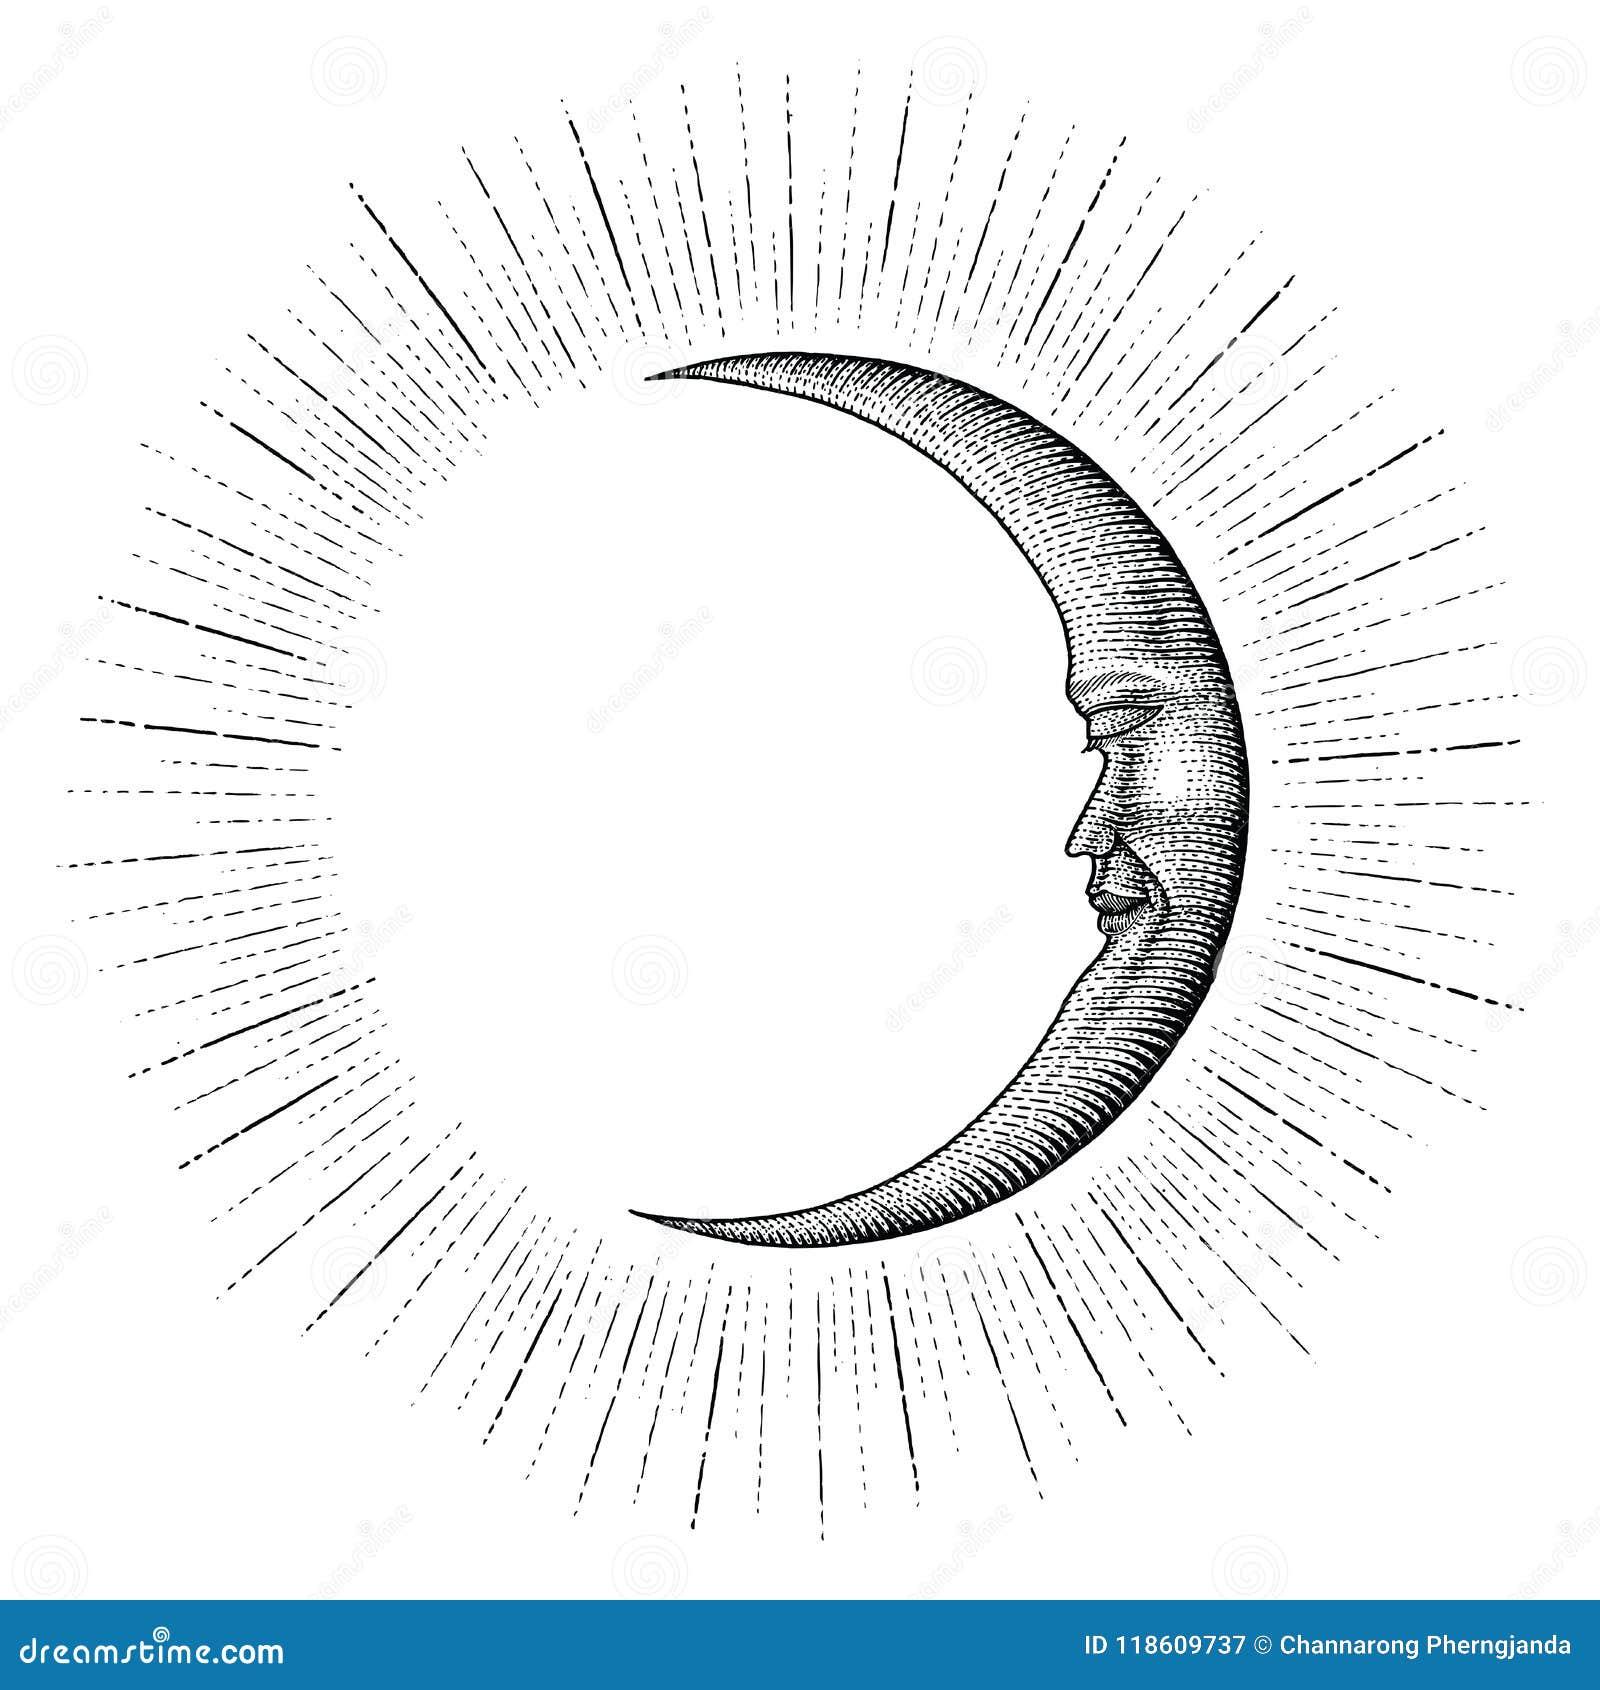 Moon Drawing Stock Illustrations 50 439 Moon Drawing Stock Illustrations Vectors Clipart Dreamstime